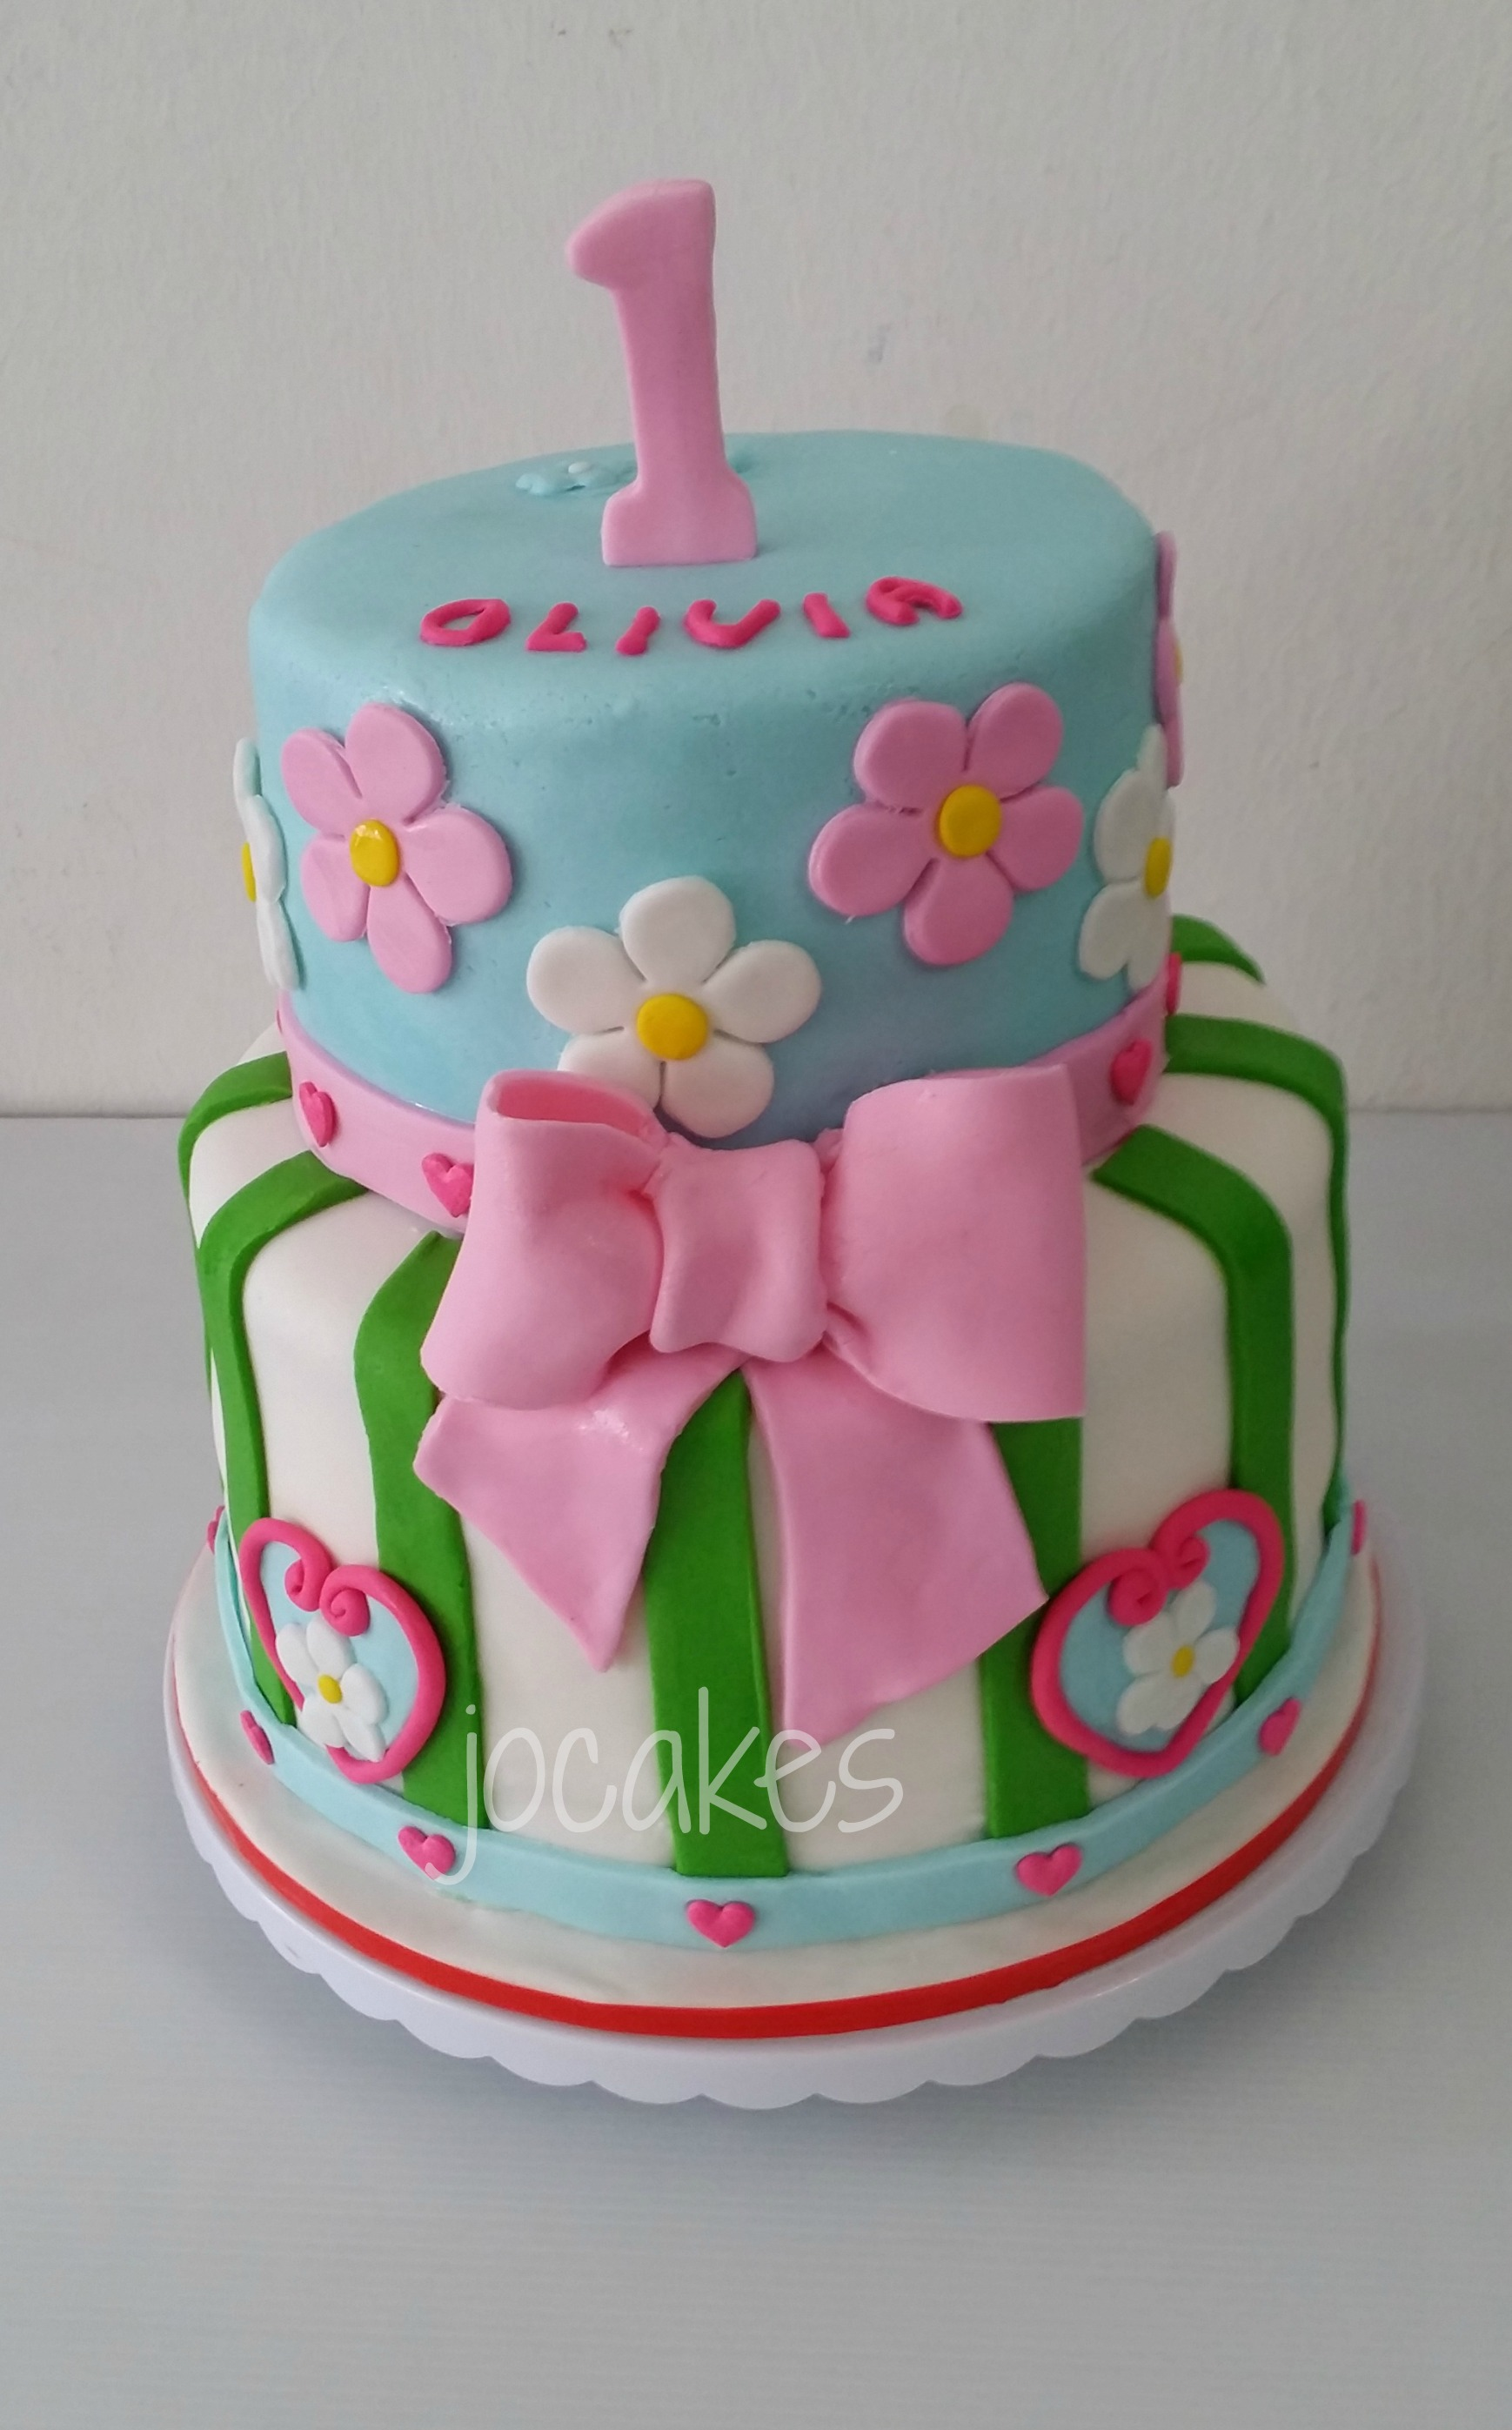 8 1 Year Old Birthday Cakes For Girls Photo 1st Birthday Cake